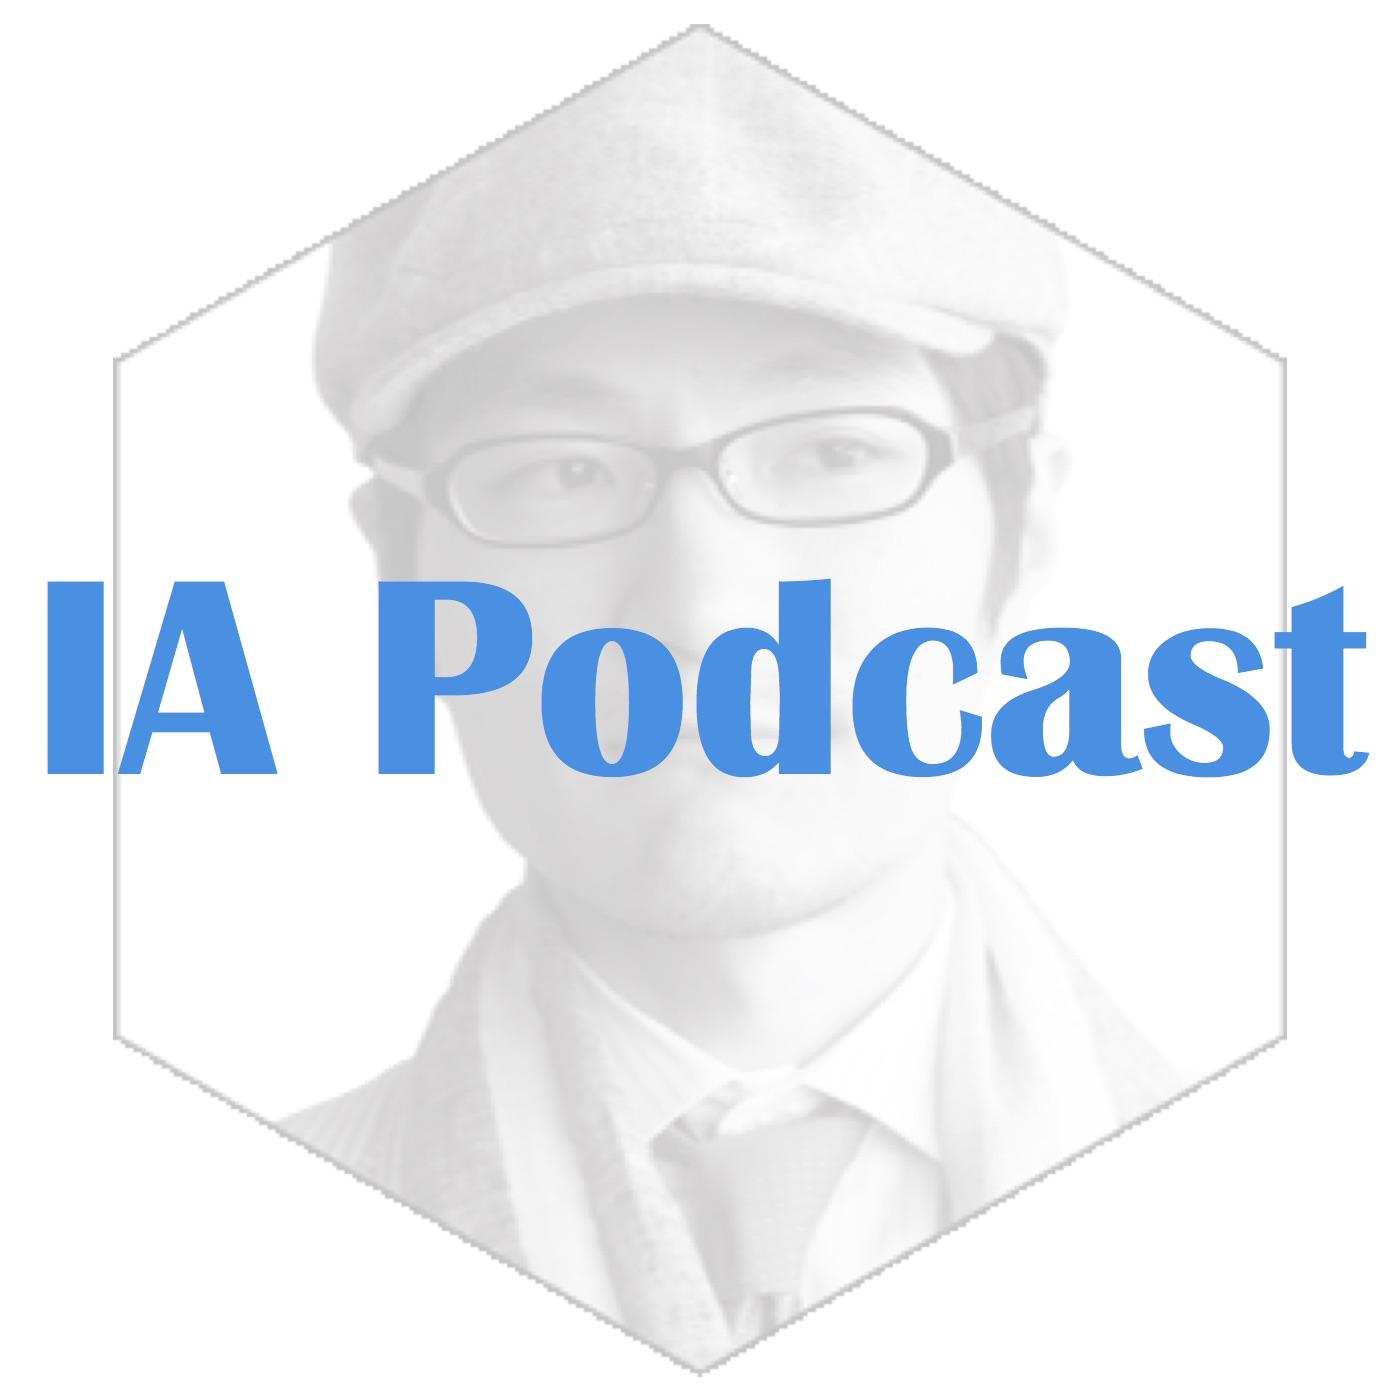 IA Podcast